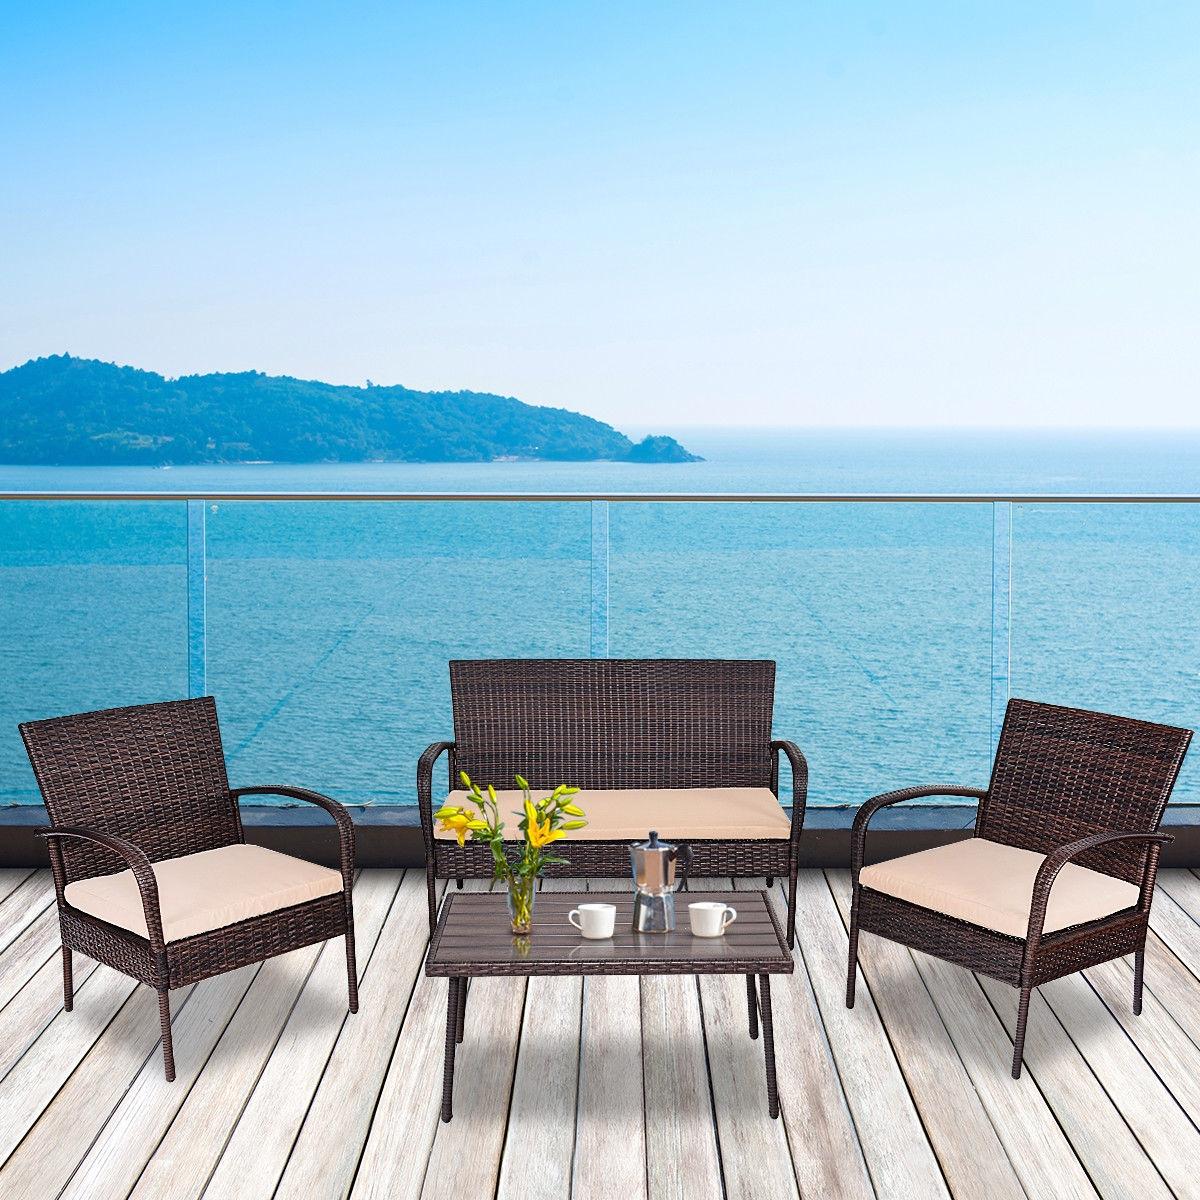 4 pcs Table Sofa Furniture Set with Cushions